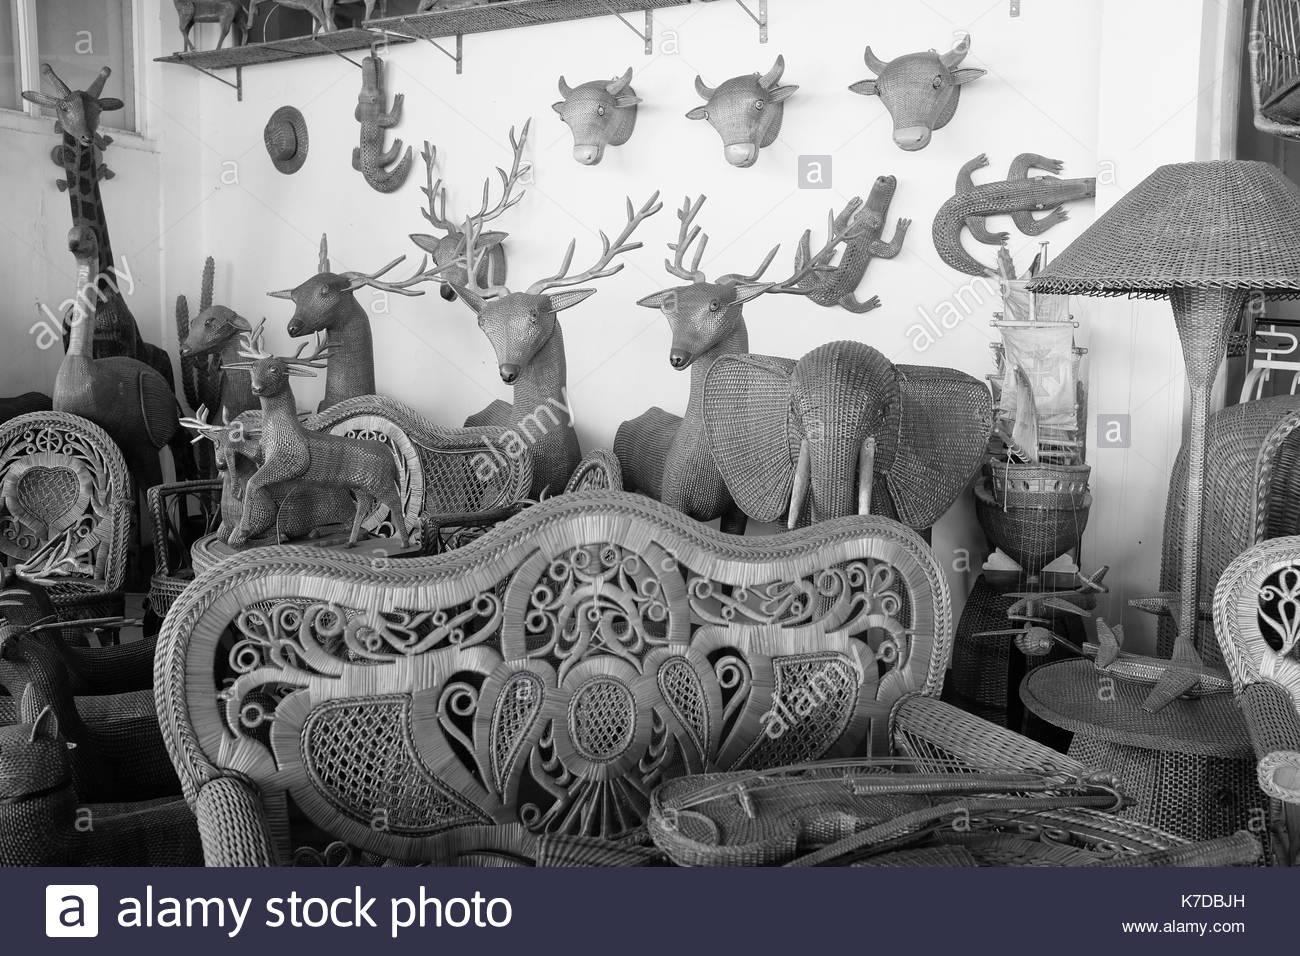 Wicker animals, Camacha, Madeira - Stock Image